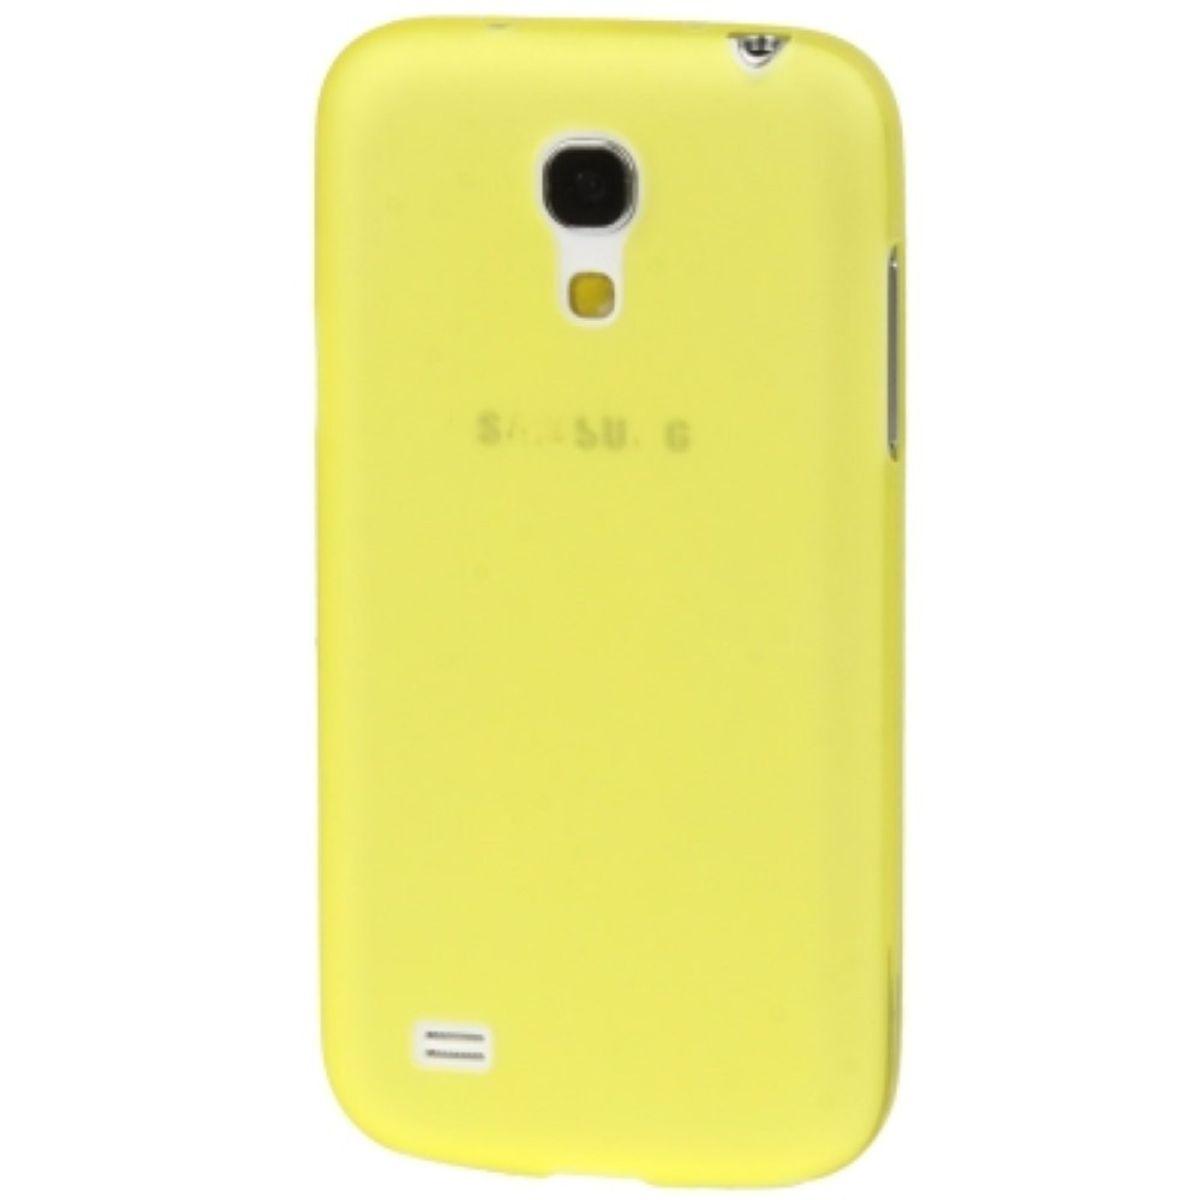 Schutzhülle Case Ultra Dünn 0,3mm für Handy Samsung Galaxy S4 mini i9190 Gelb Transparent